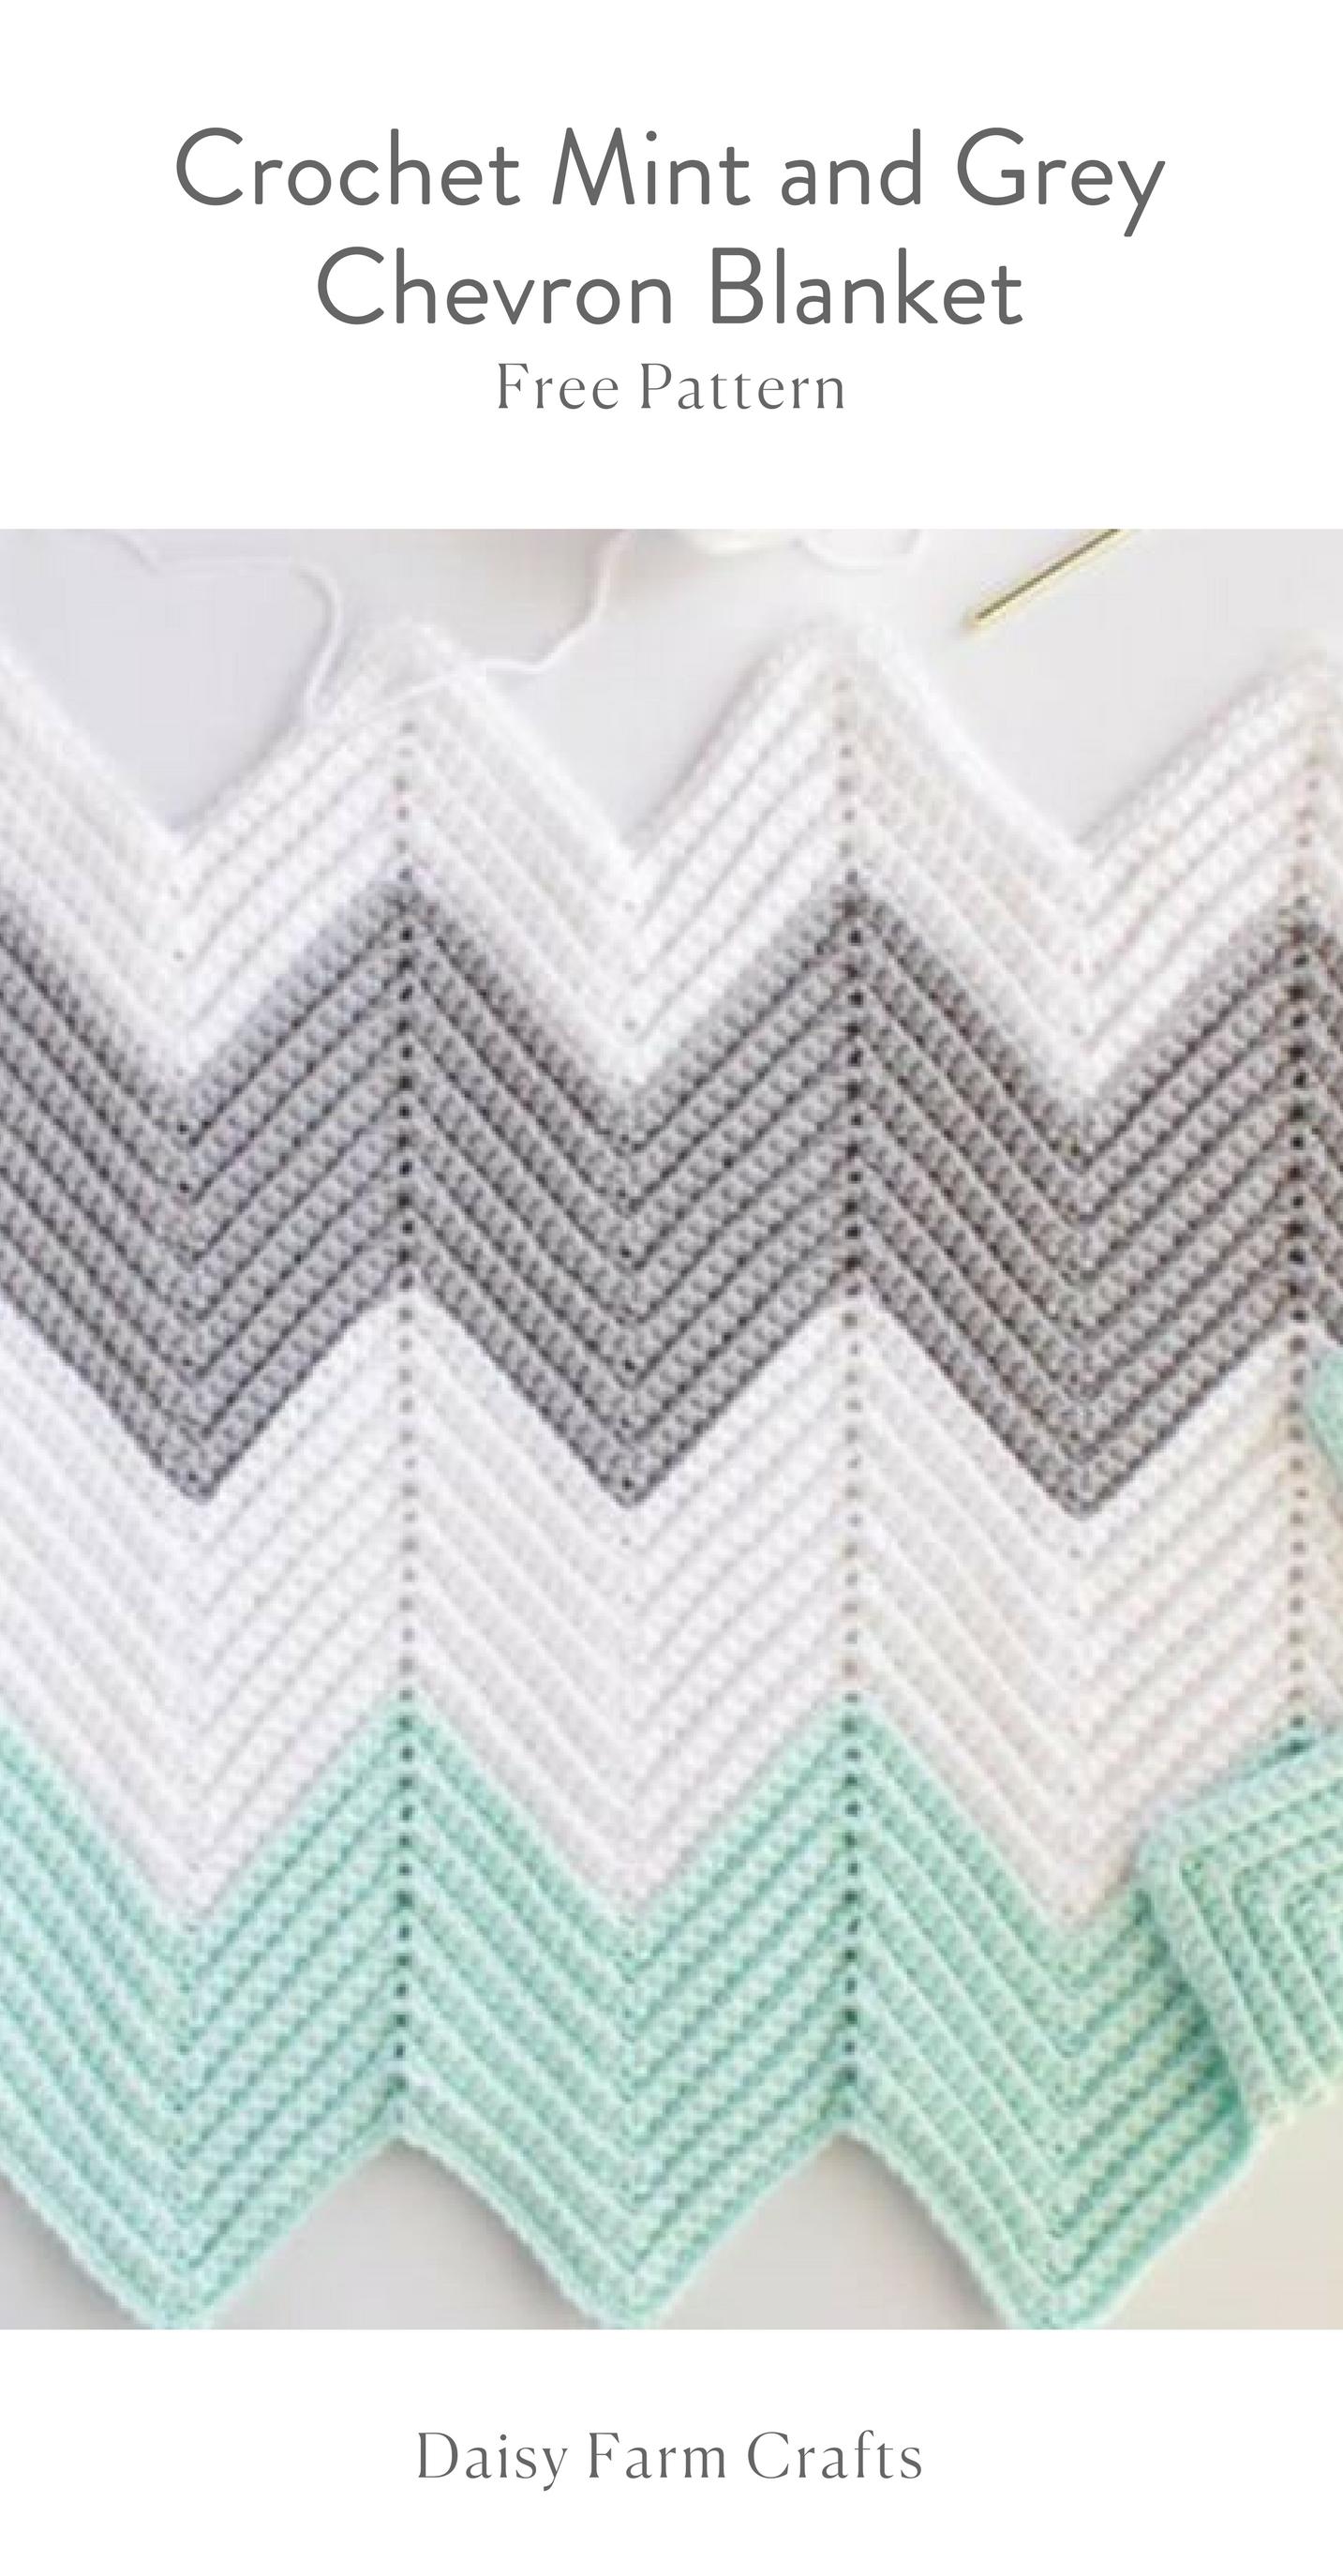 Free Pattern - Crochet Mint and Grey Chevron Blanket | Crochet baby ...